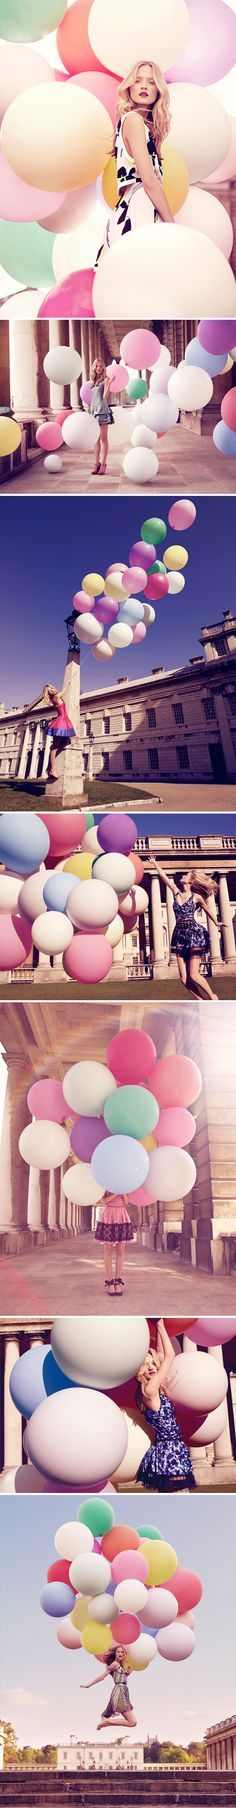 99 Luftballons | Zuckermonarchie Blog